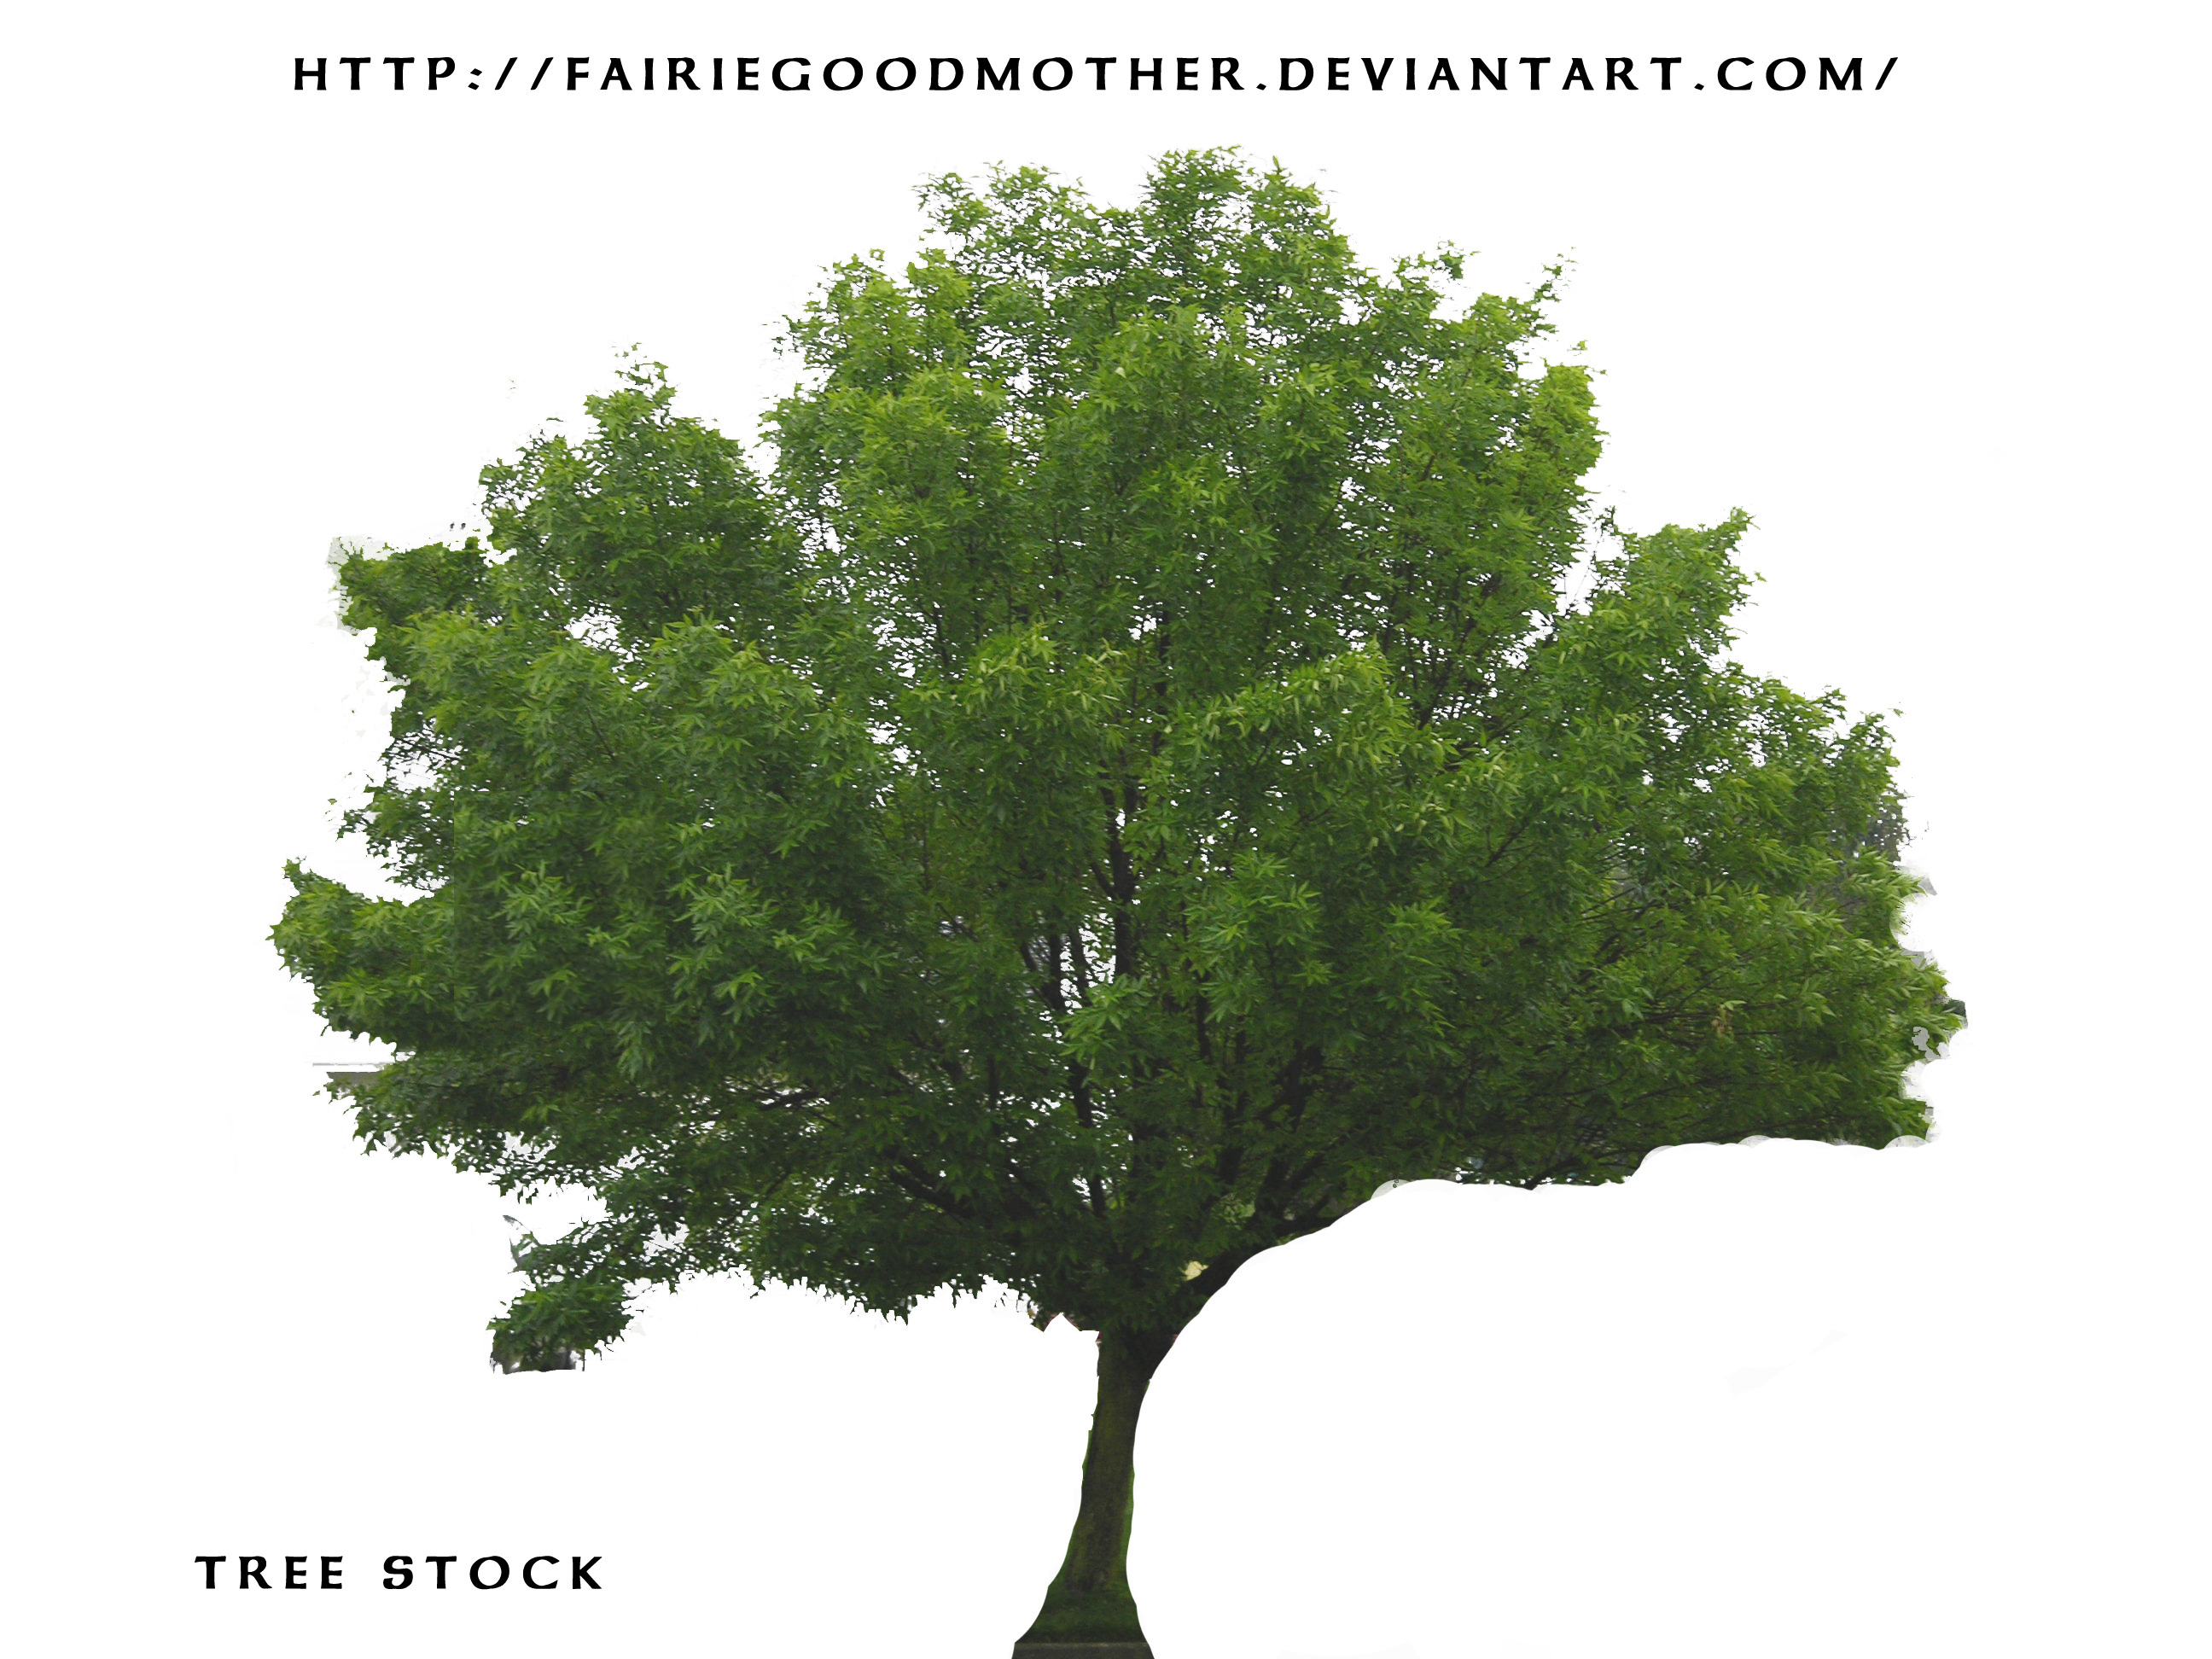 Tree Stock Psd By FairieGoodMother Tree Stock Psd By FairieGoodMother - Narra Tree PNG